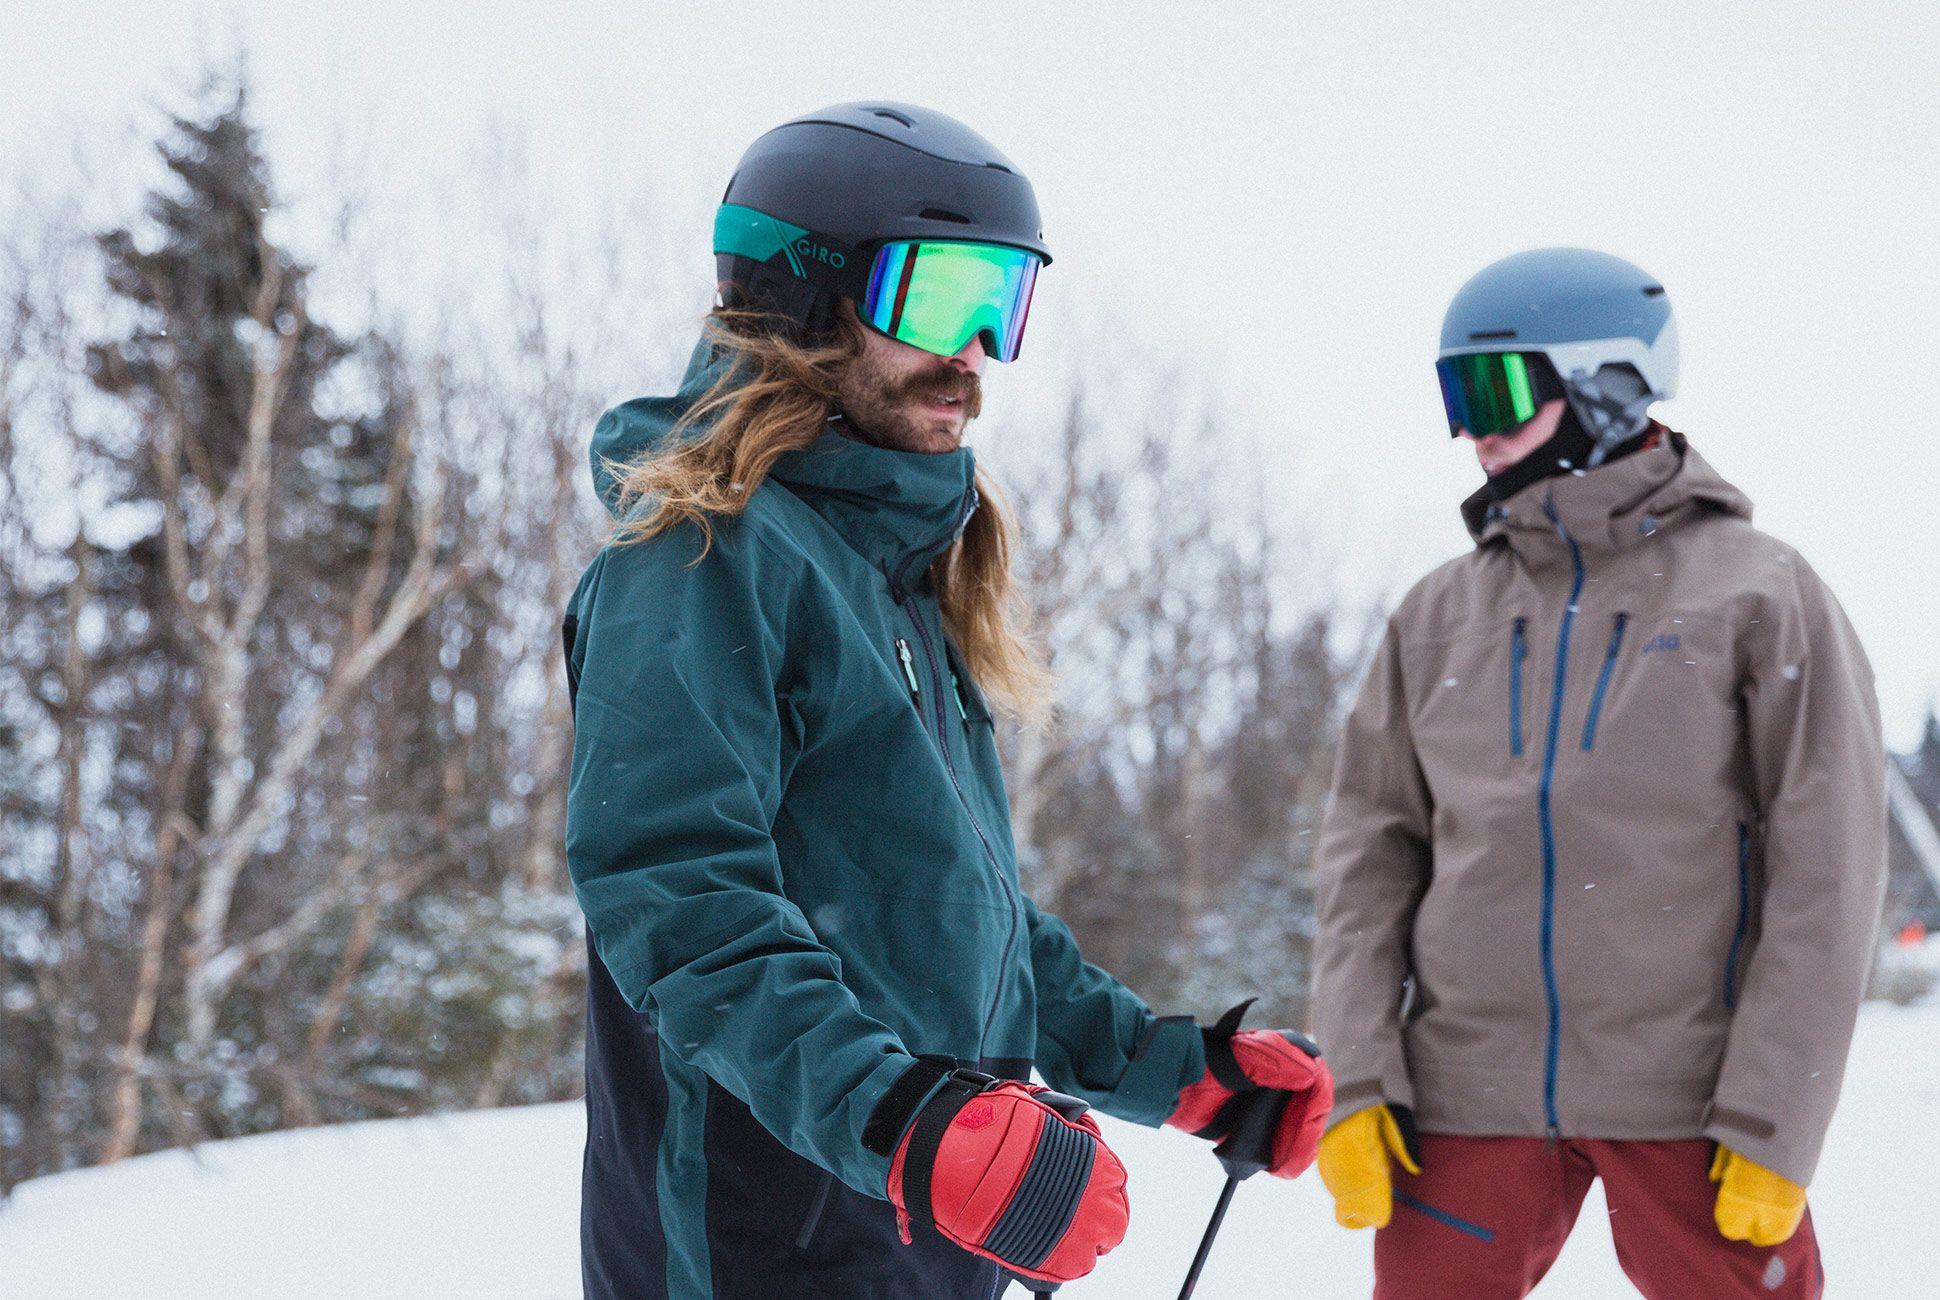 ultimate-ski-and-snow-gear-patrol-trew-slide-5